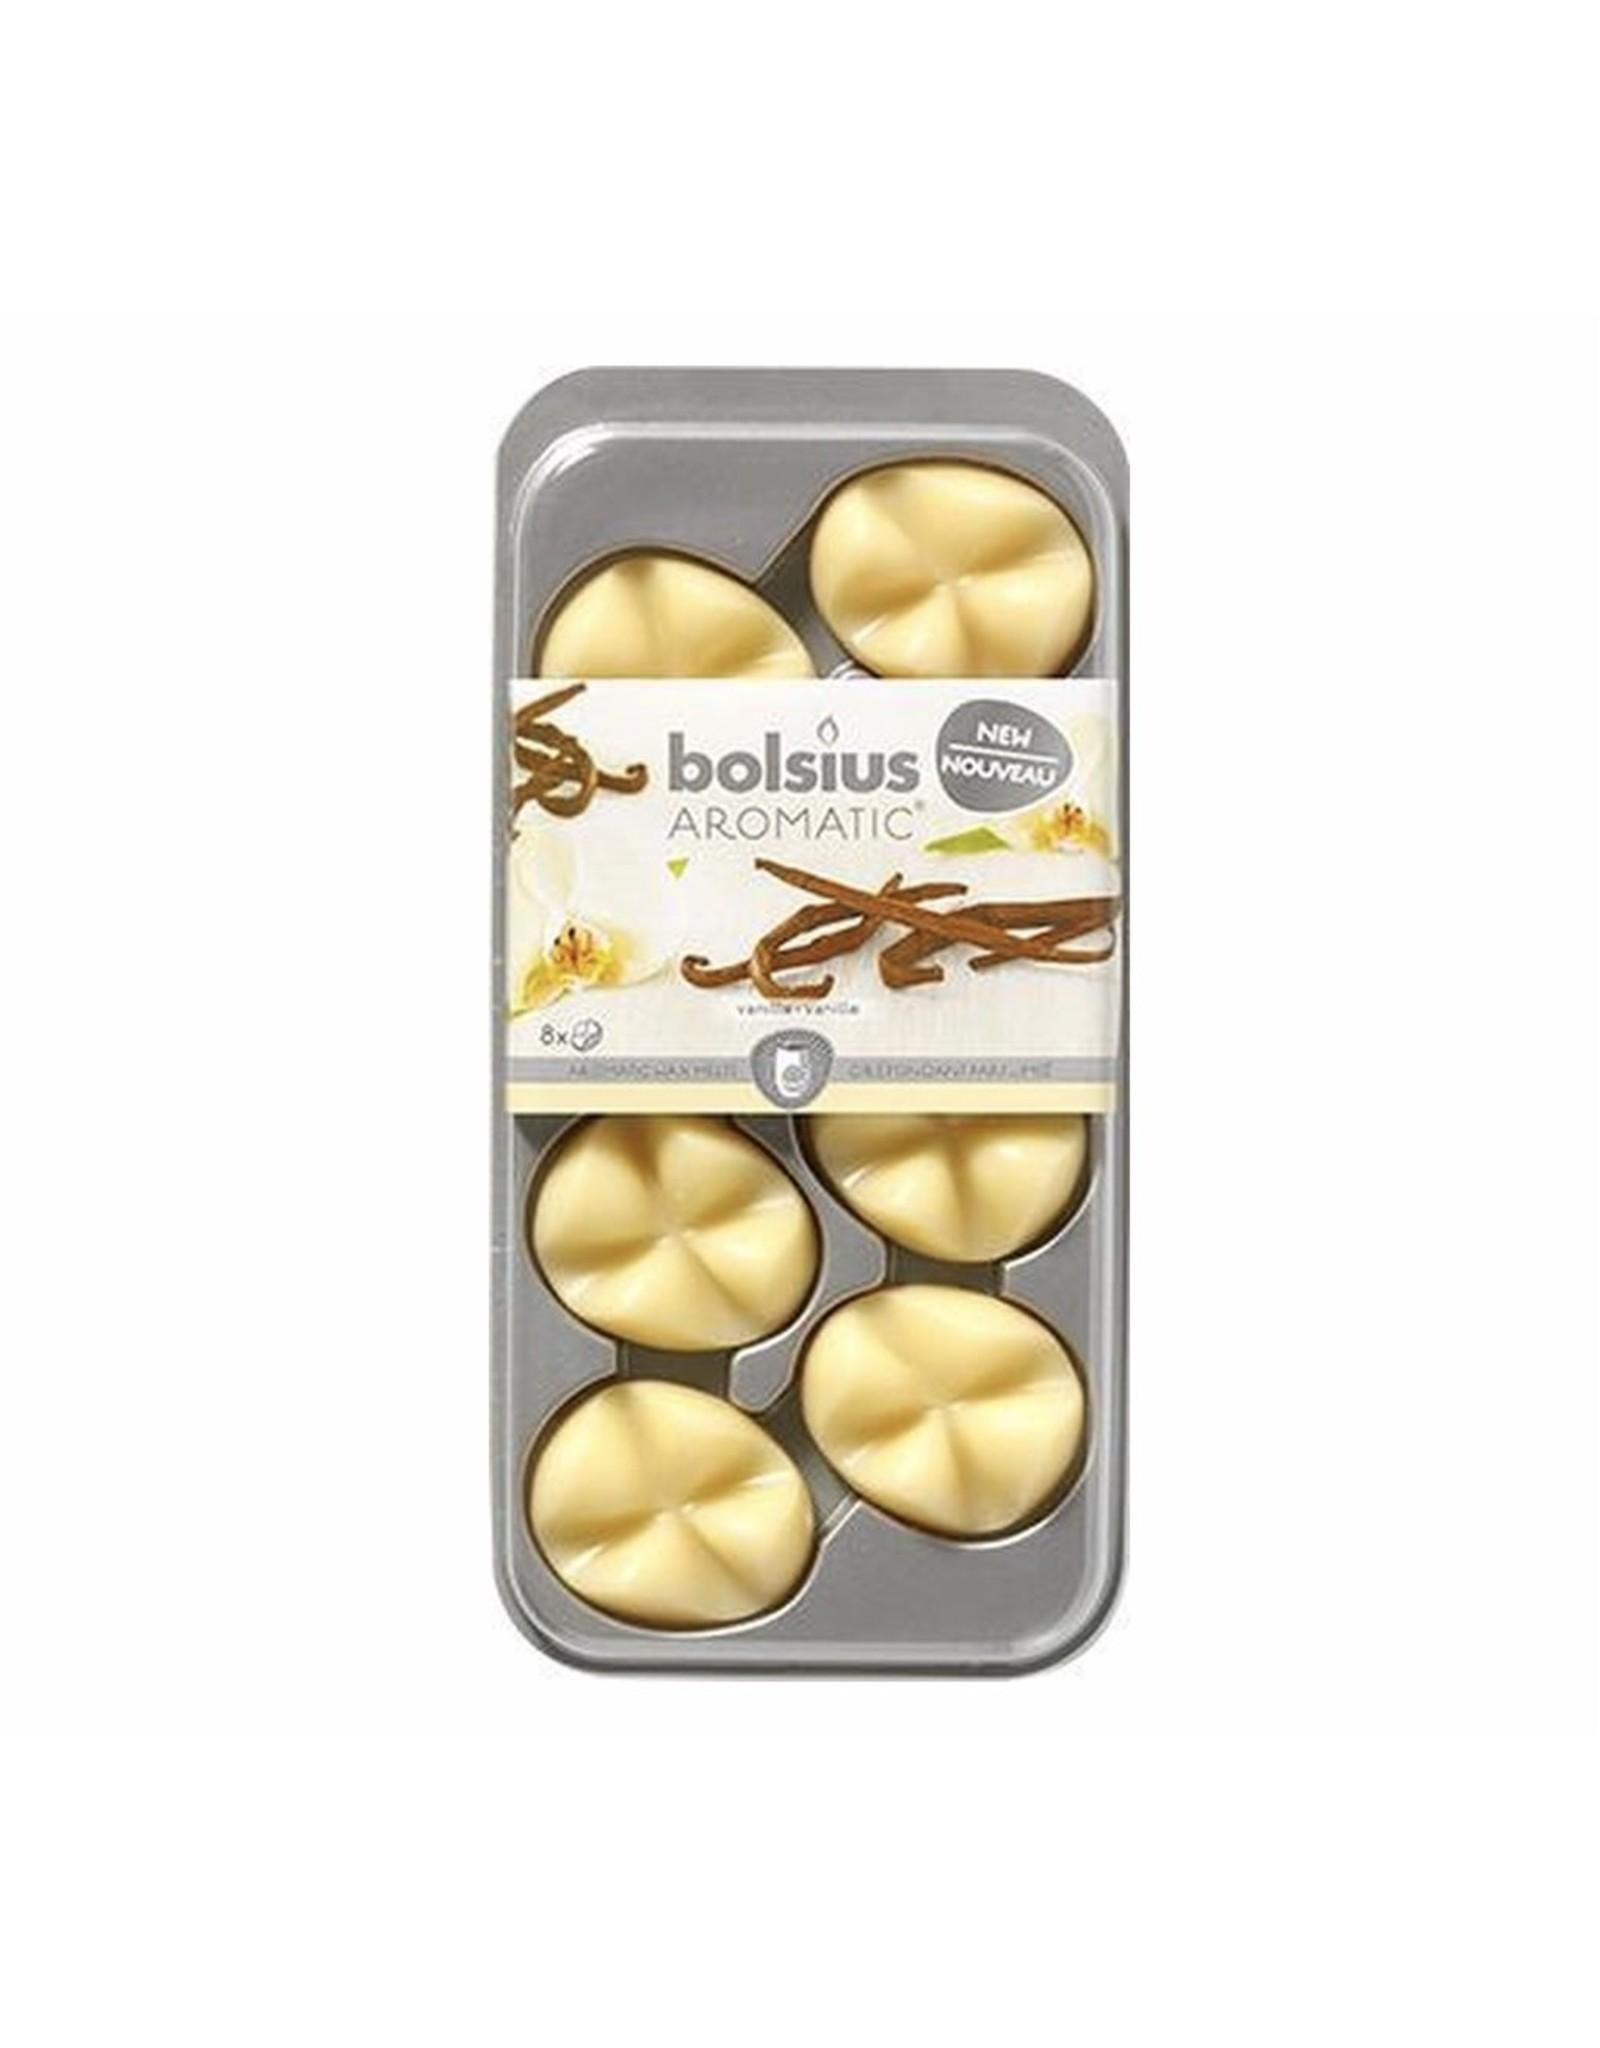 Bolsius Aromatic Wax Melts - Vanille